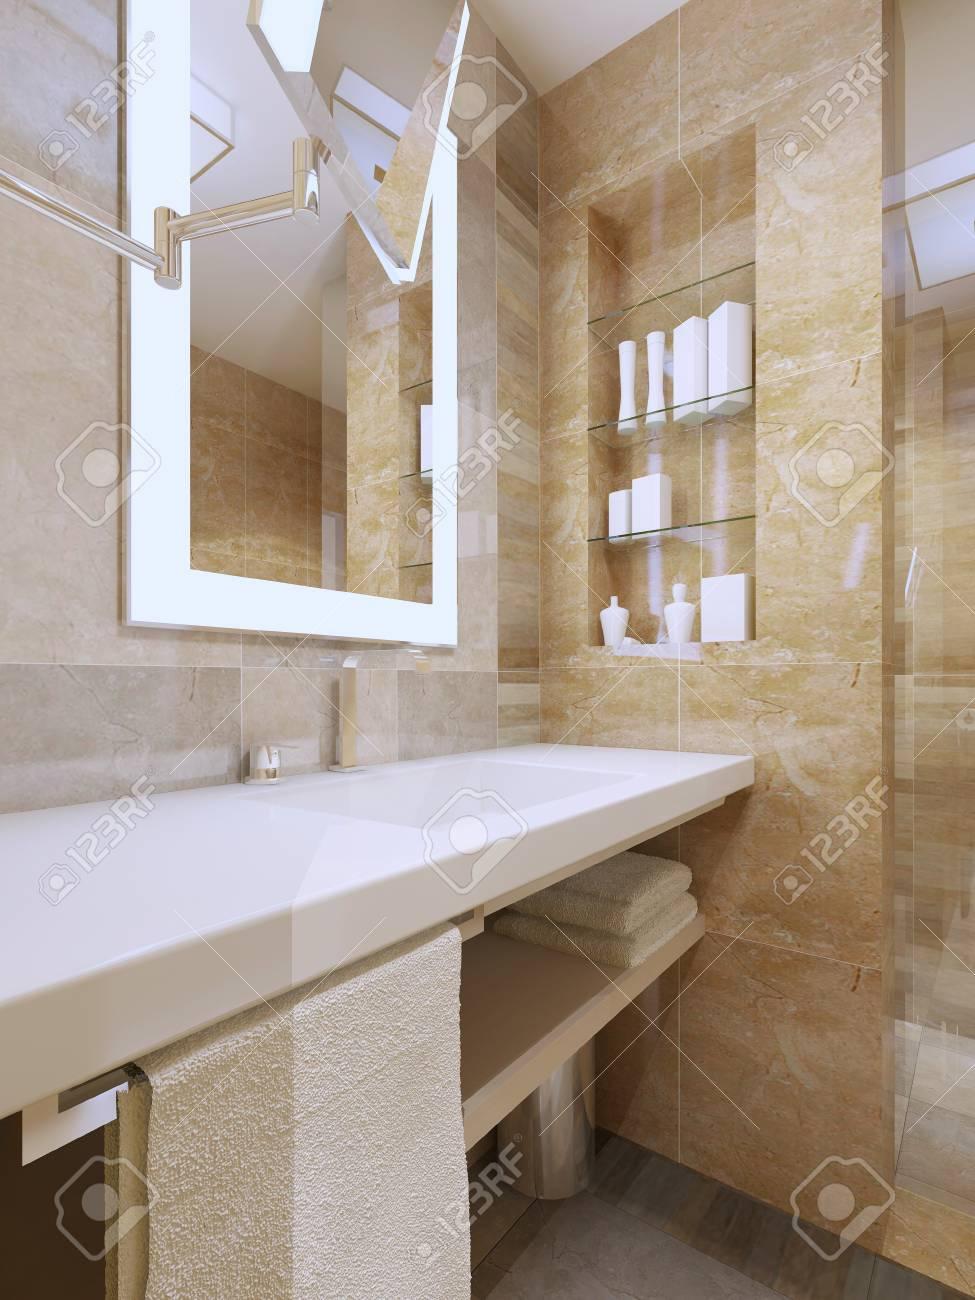 Luxury Bathroom Interior Sink Console With White Ceramic Countertop Niche Mirror Frame